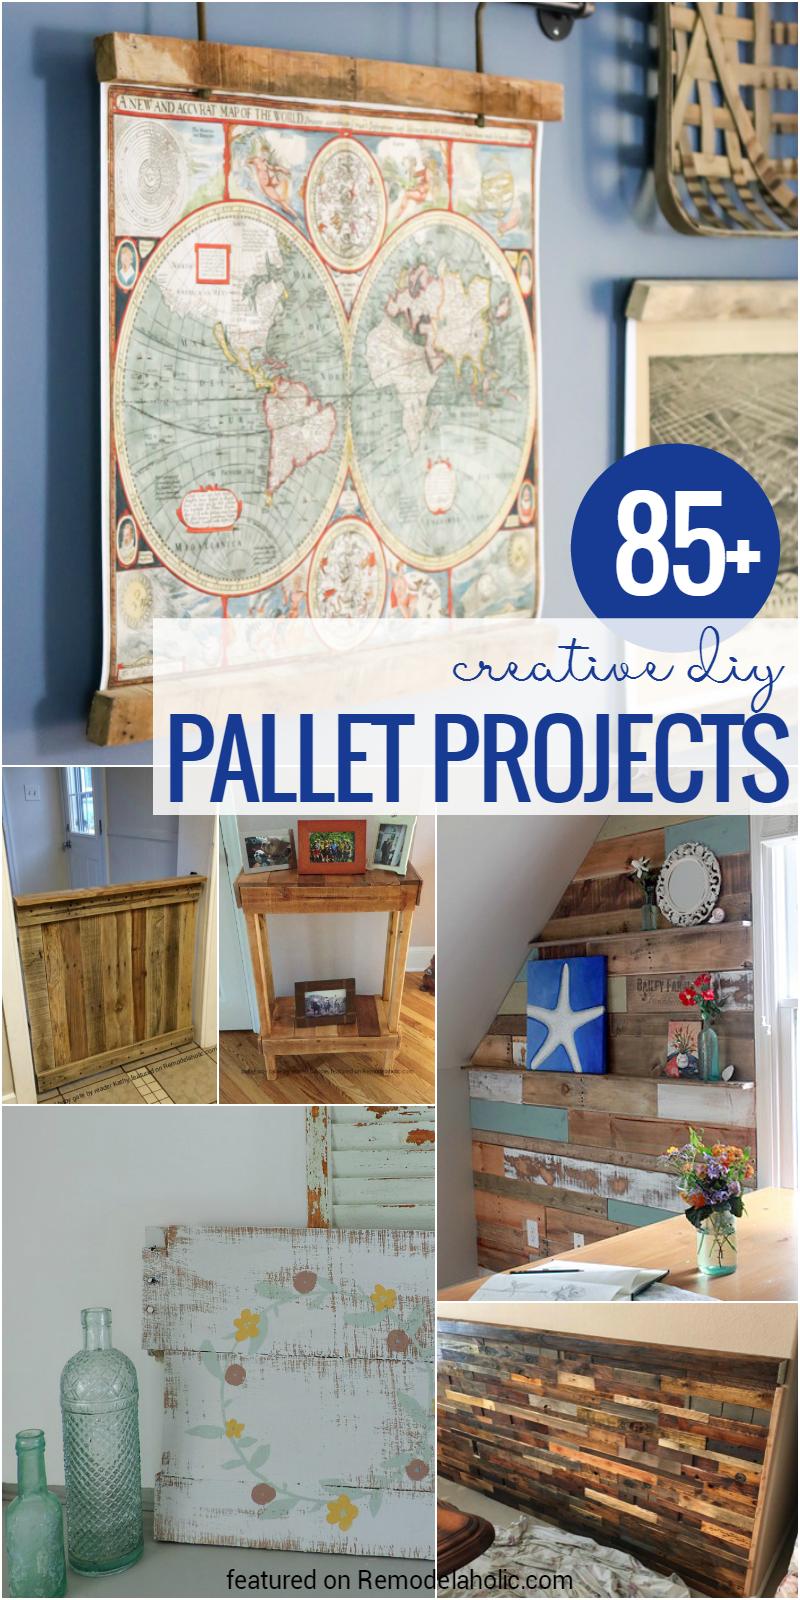 85 Creative Diy Pallet Projects Remodelaholic Bloglovin  # Muebles Jasmine